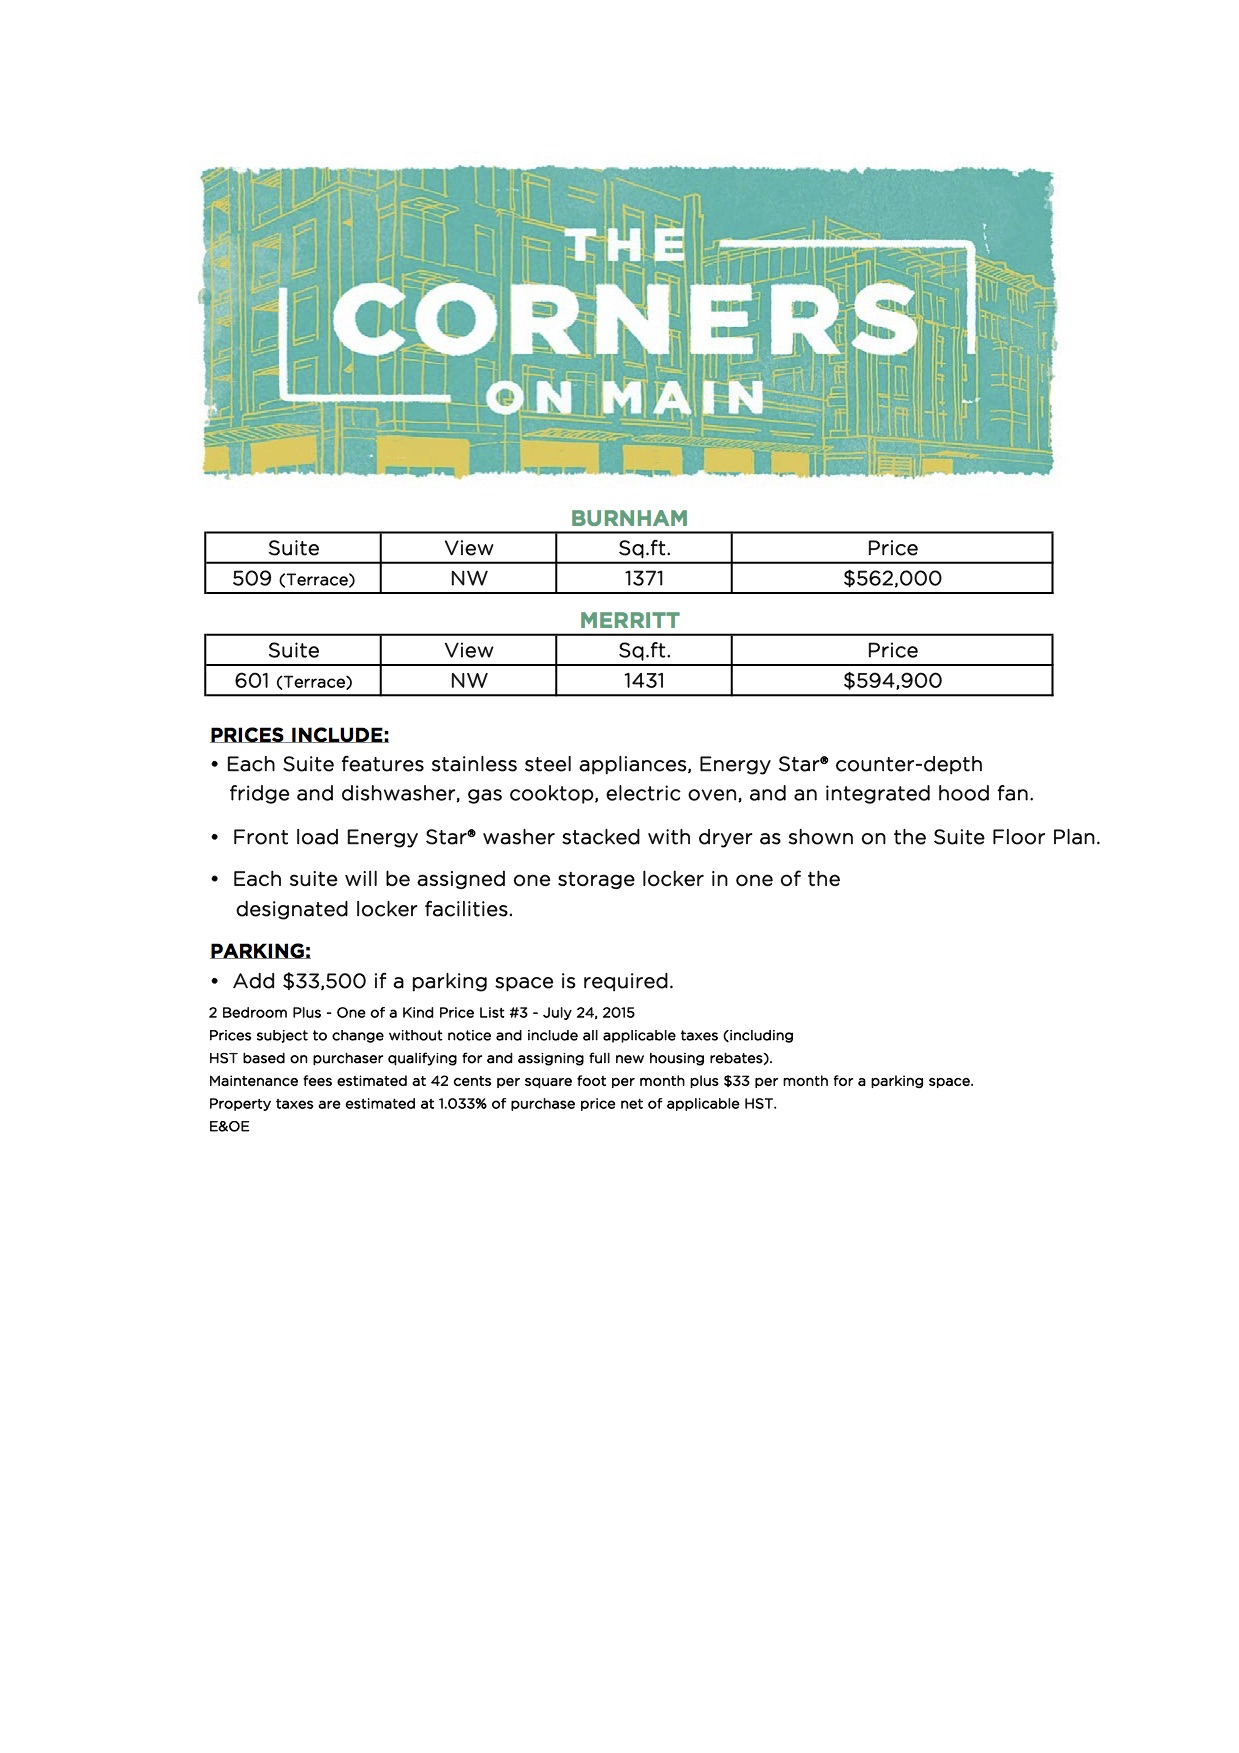 Corners On Main Pricelist_July_24_20157.jpg